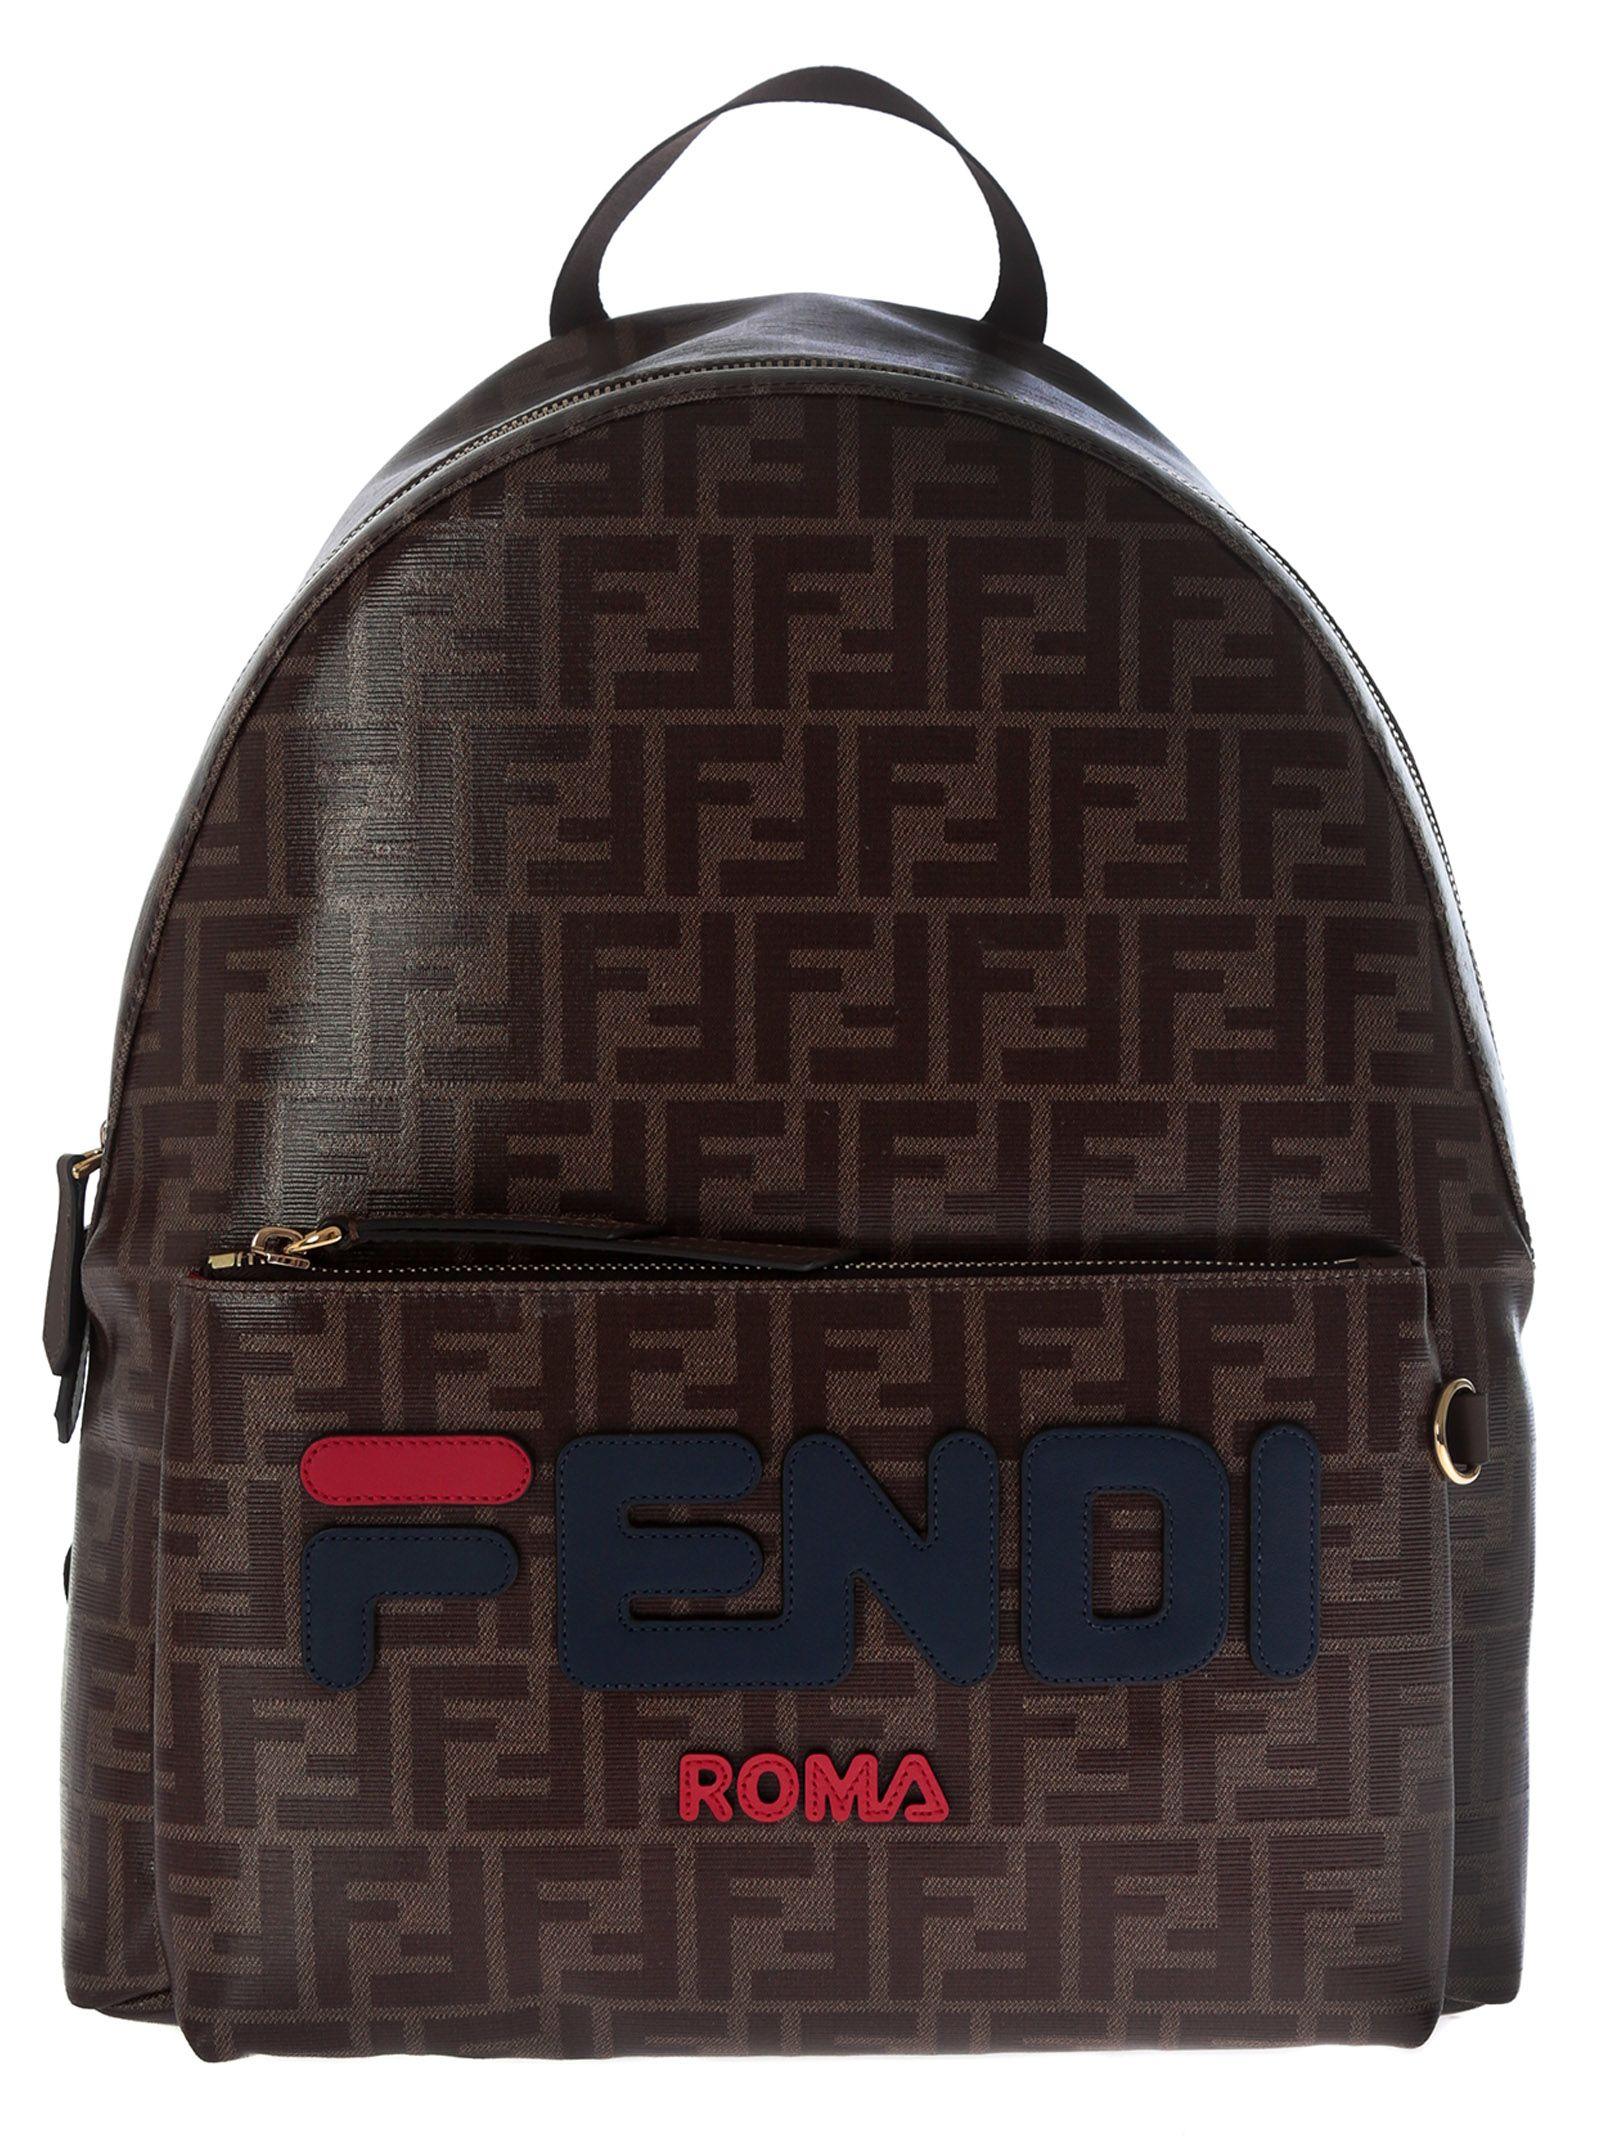 ca73cbe1b952 Fendi Fendi Fendimania Double F Print Backpack - 10800381